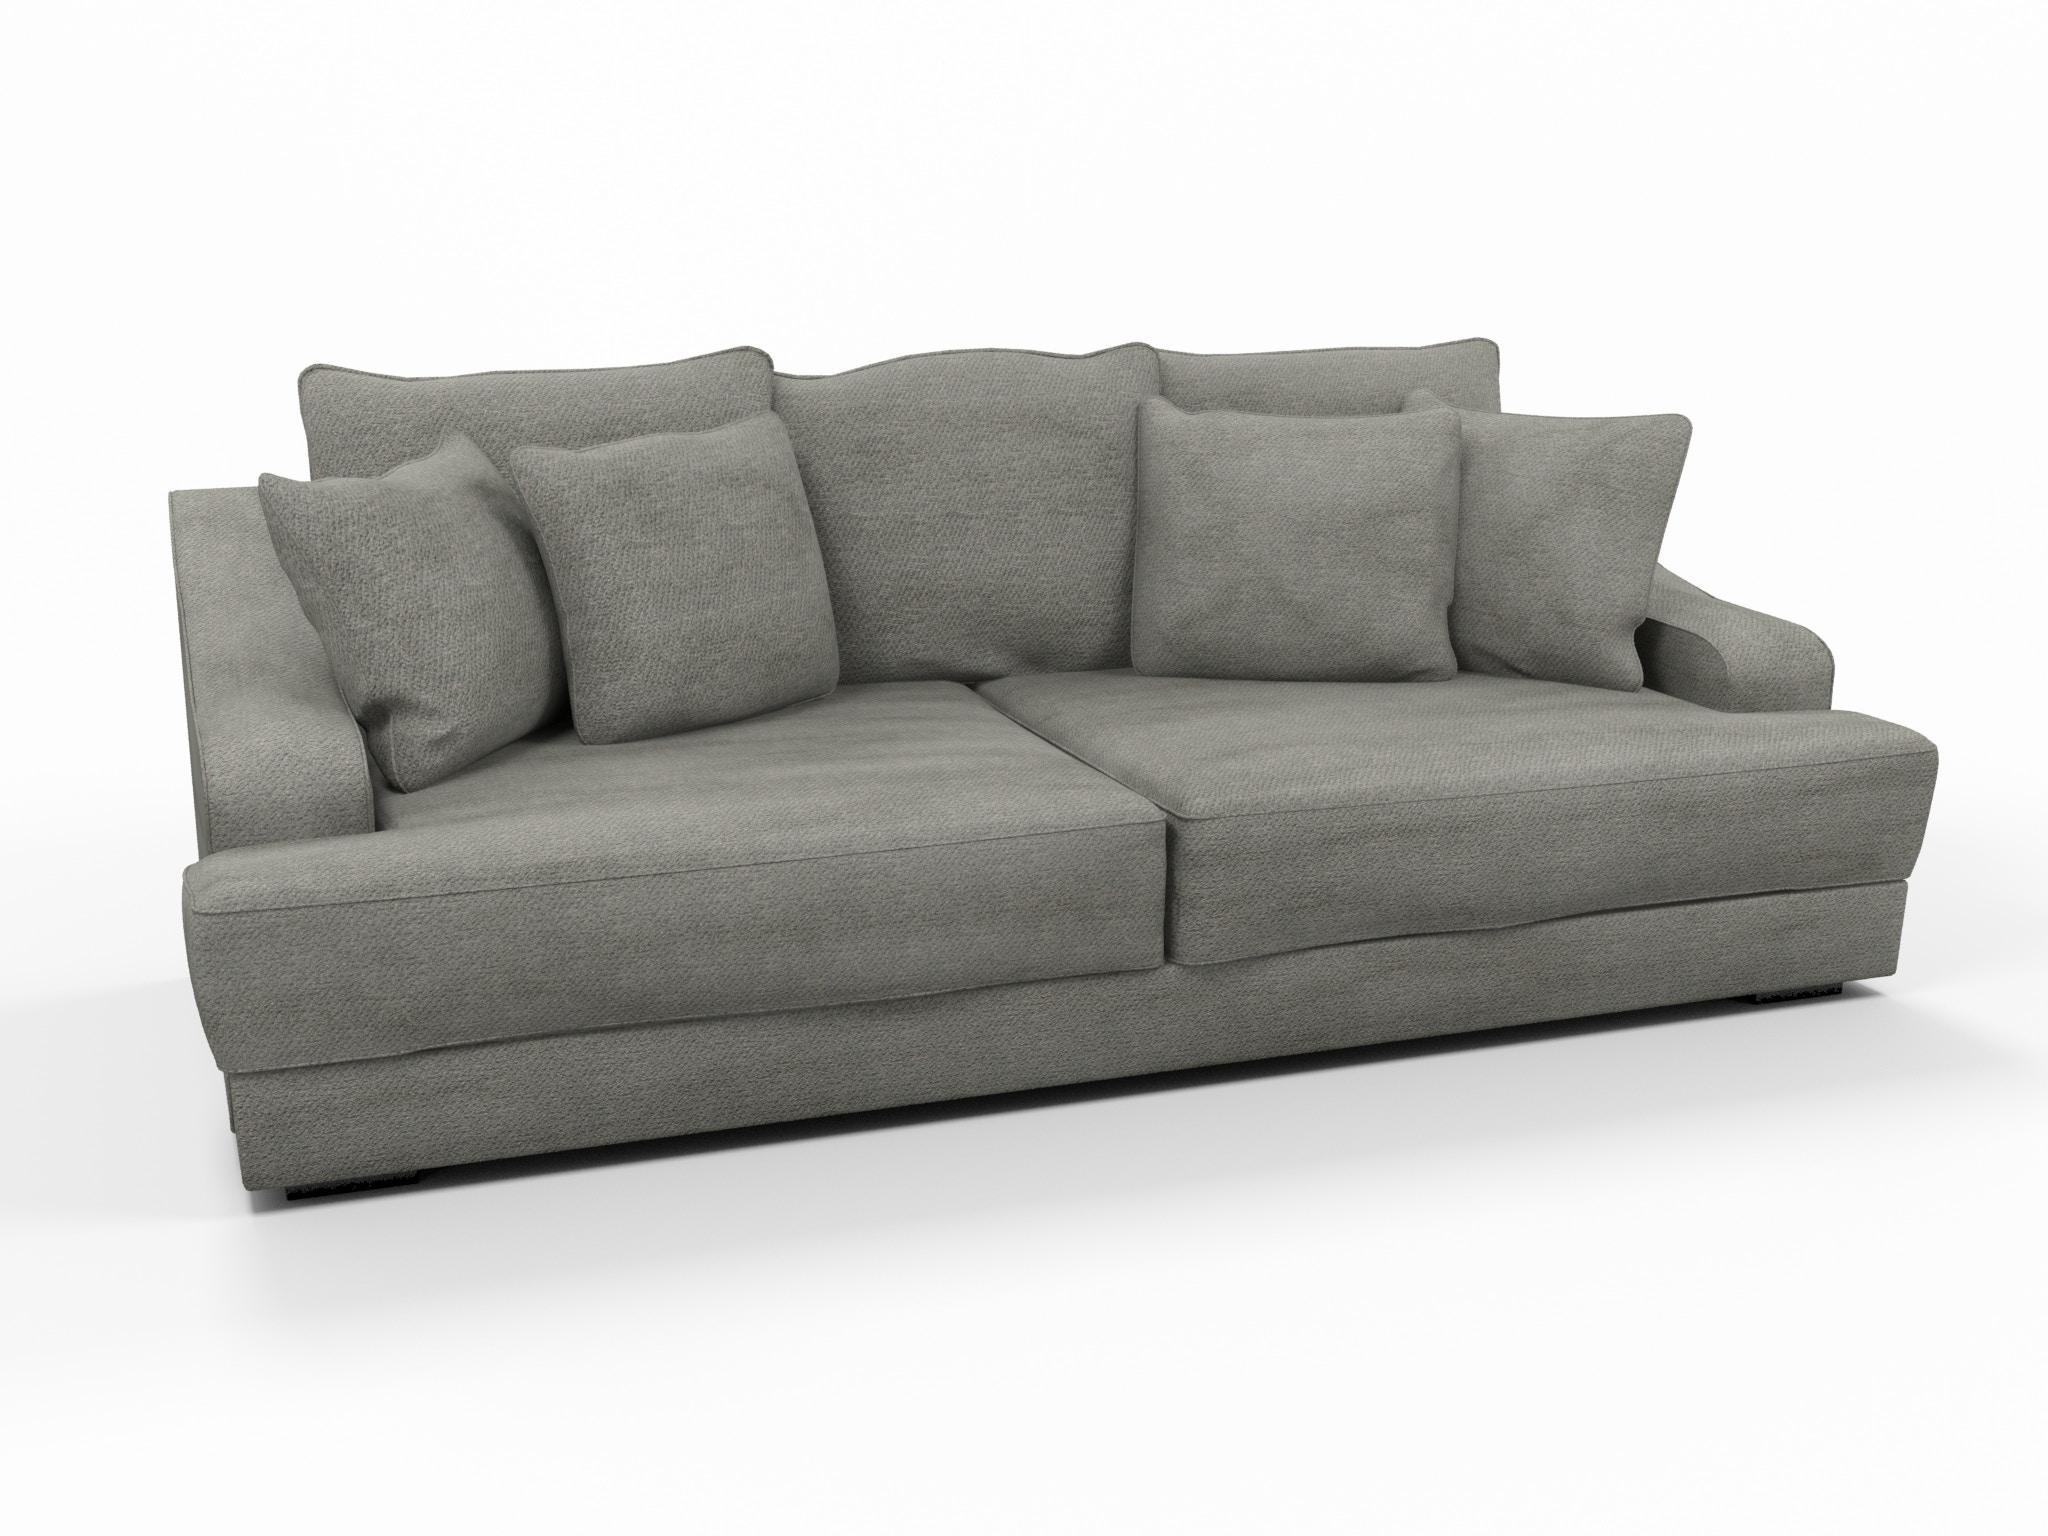 sofa mart lubbock tx second hand brown leather kent master living room monterrey